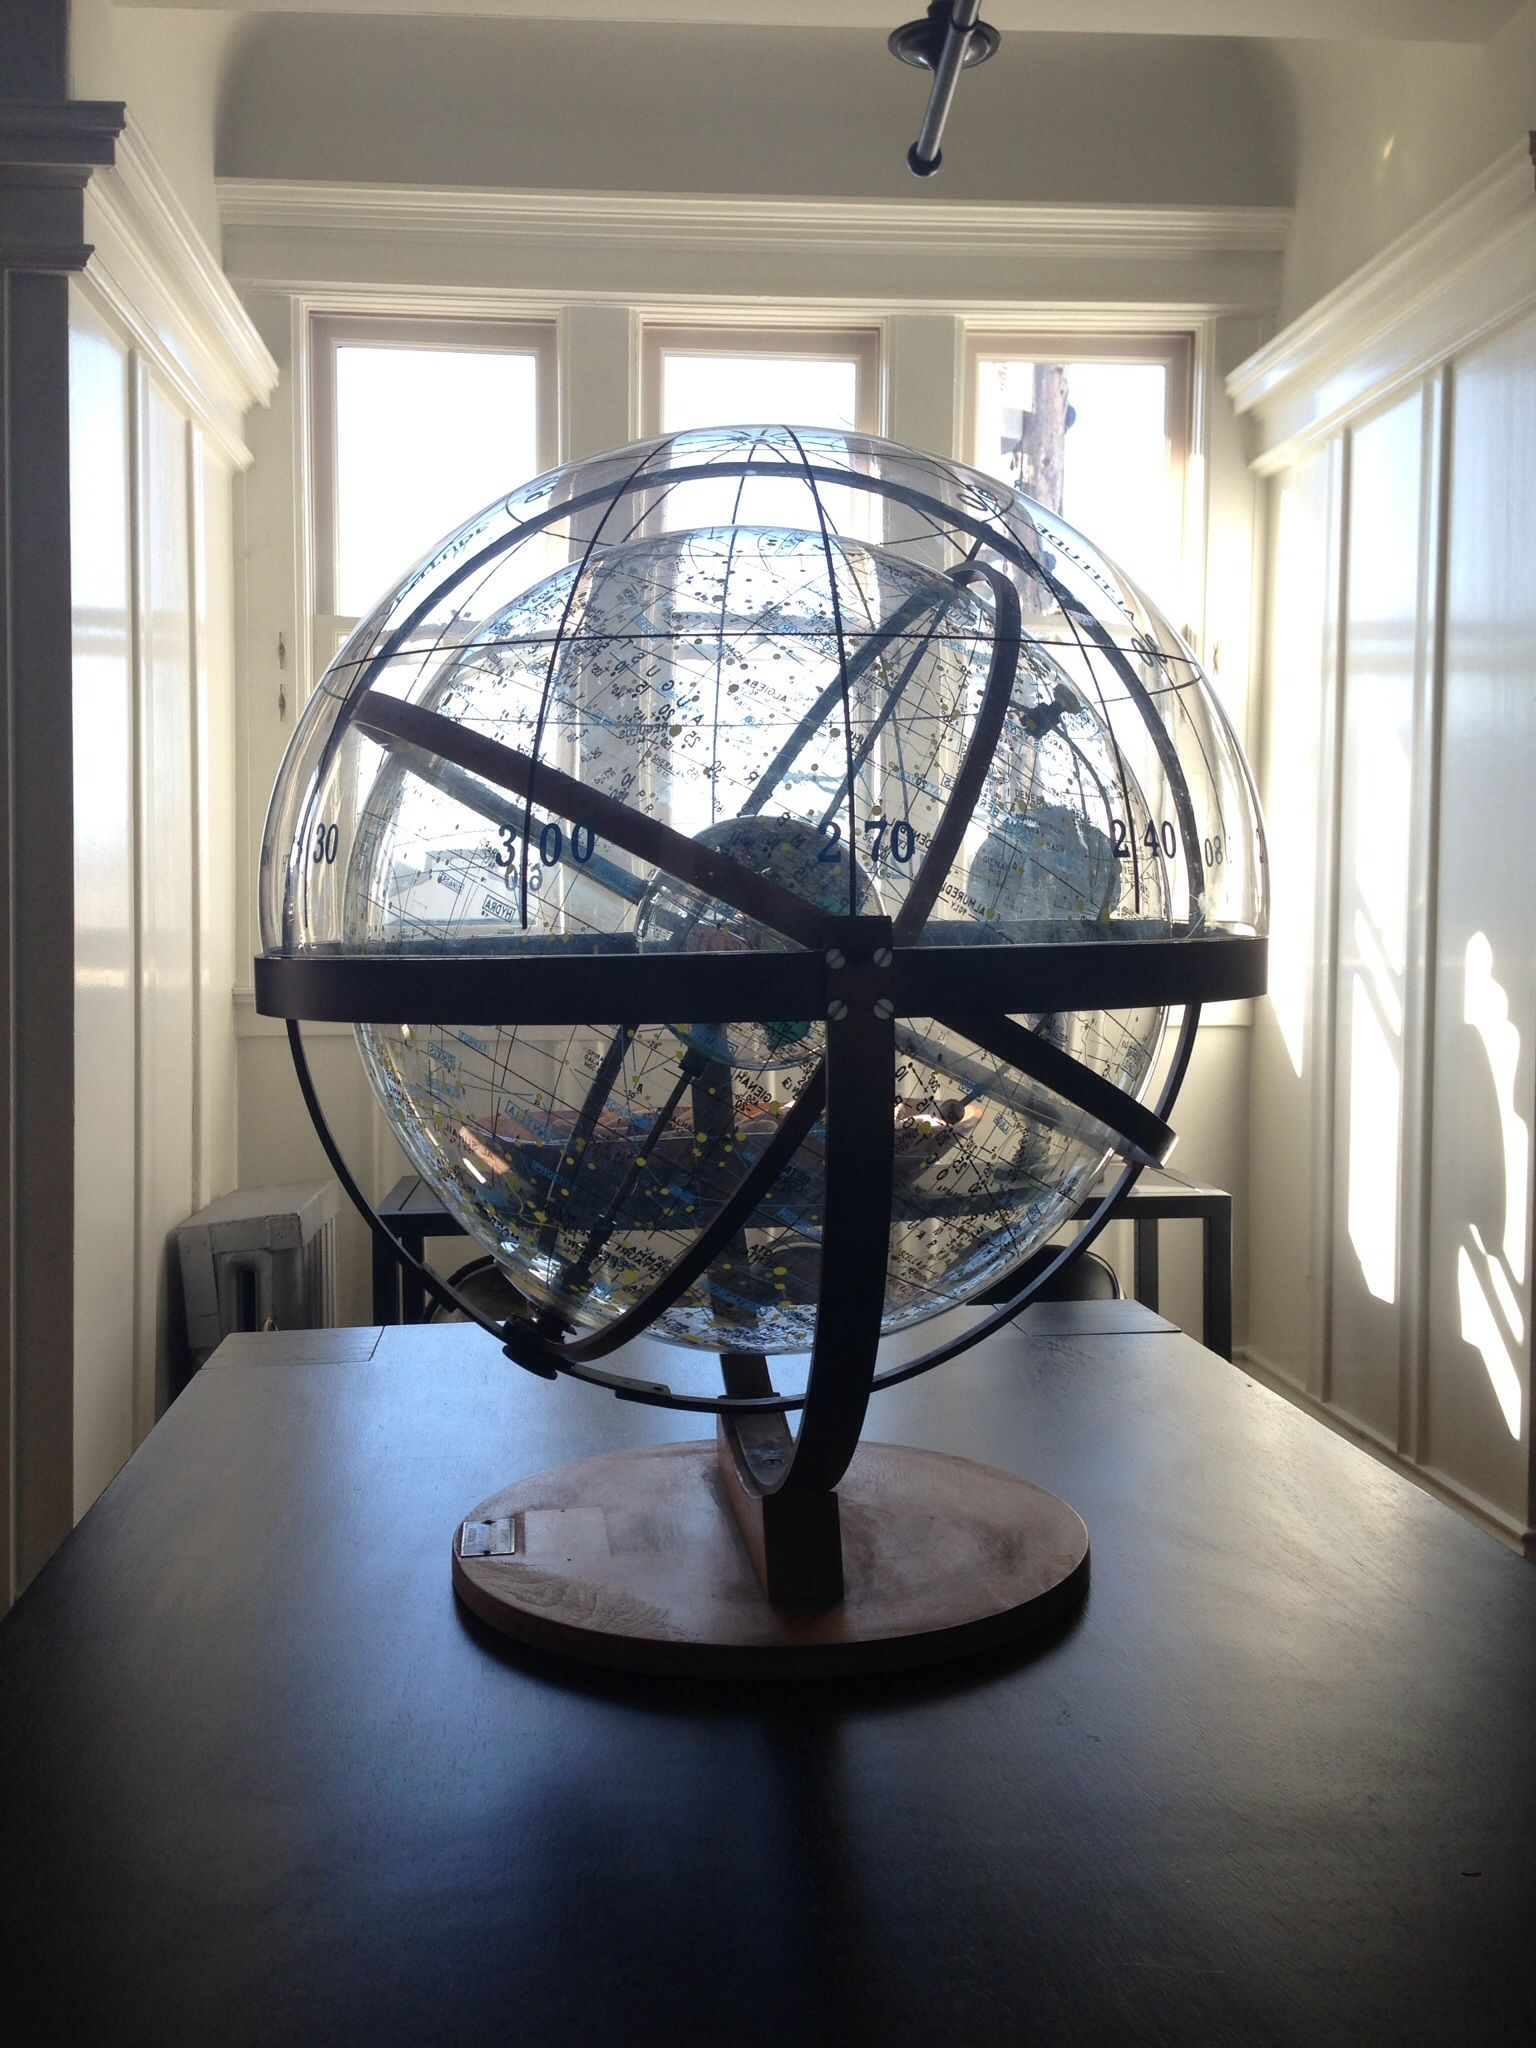 Farquhar Transparent Celestial Globe 1946 Recycled Windows Little Houses Home Decor